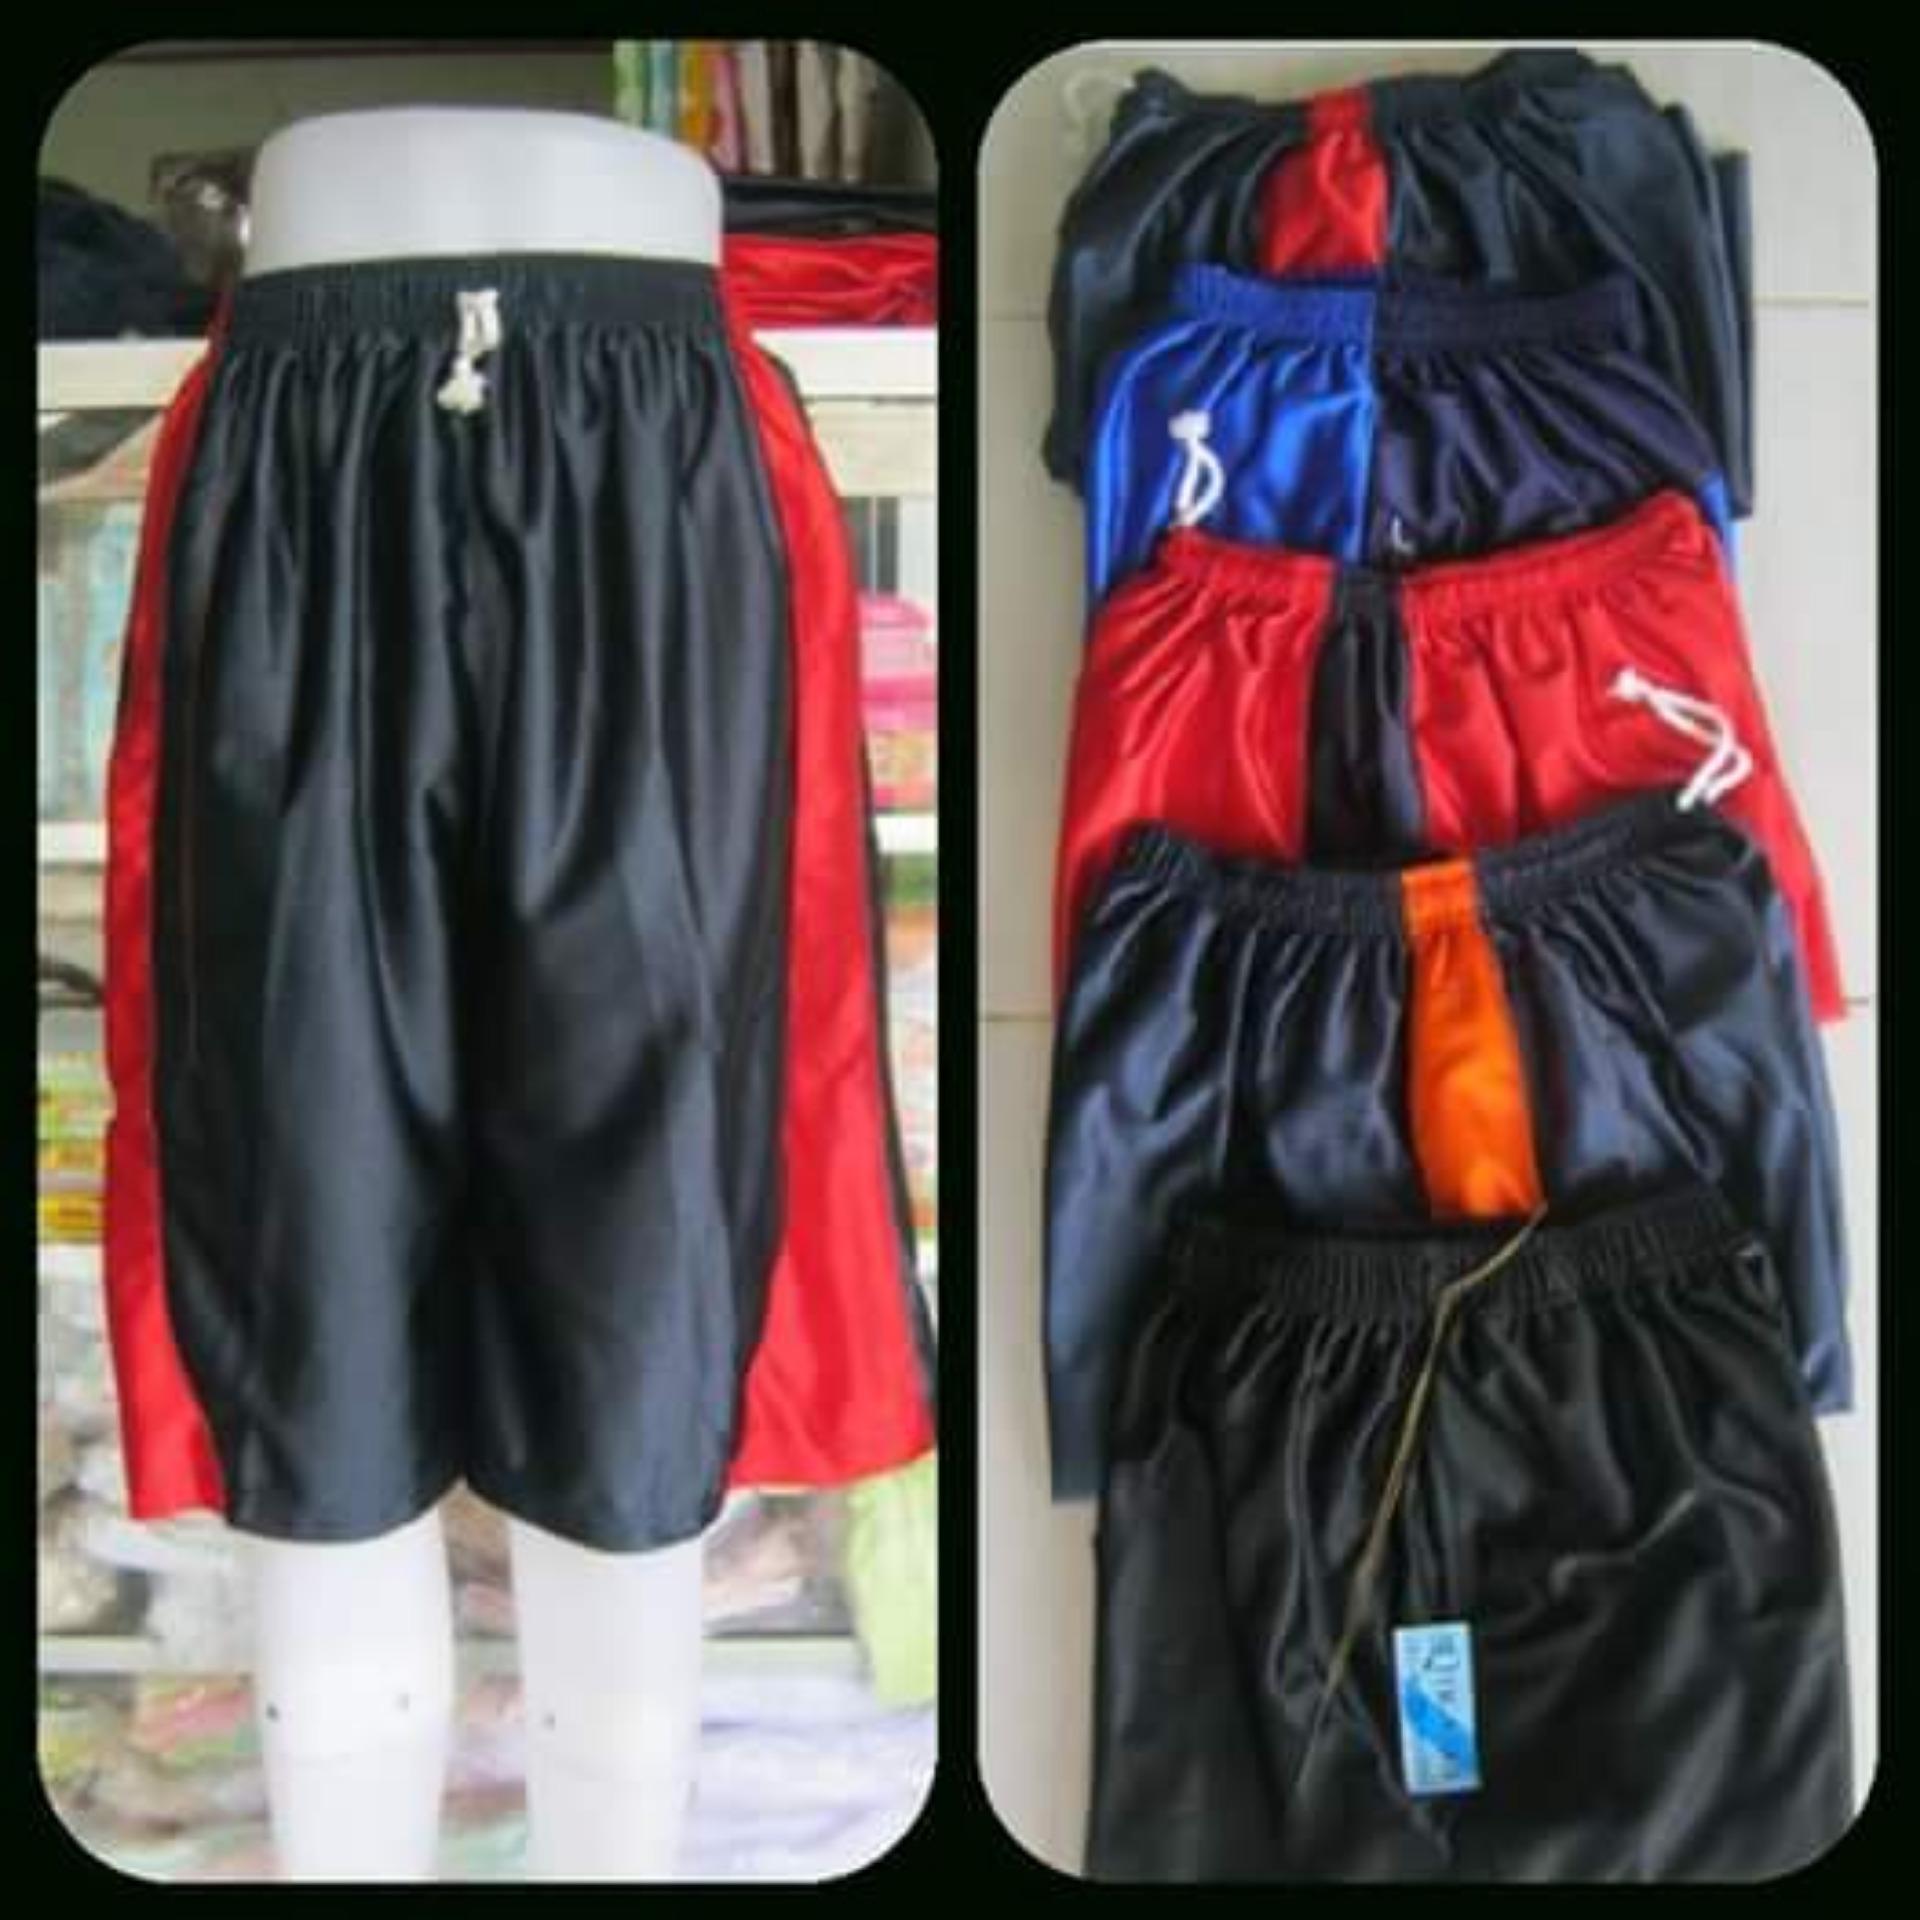 Eshop Checker Celana Basket Super Jumbo Kolor Pria Pendek Santai Polos Big Size Sizegrosir Murah